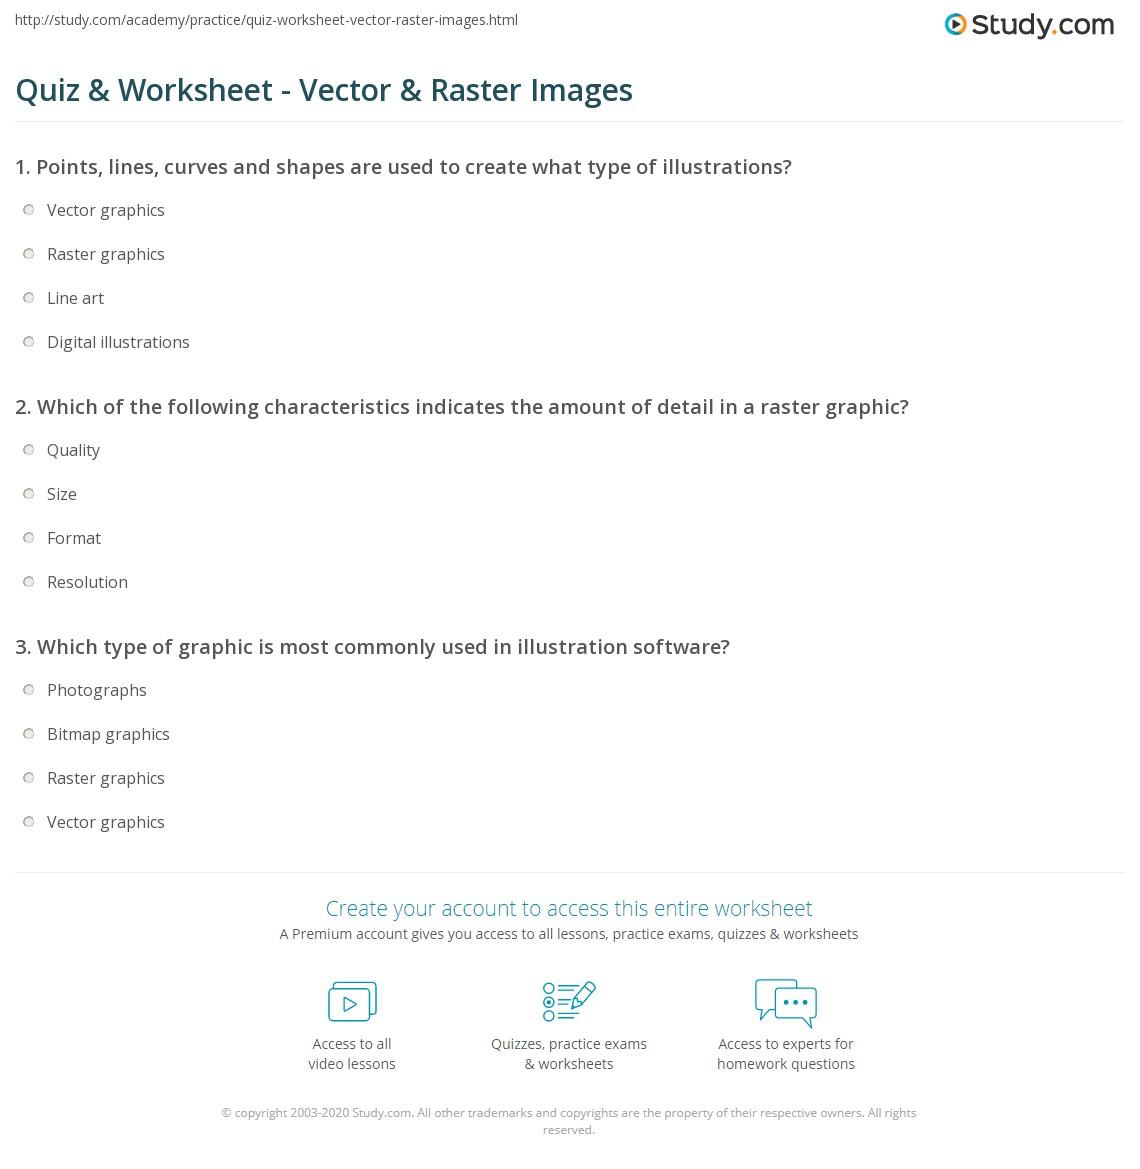 Quiz & Worksheet - Vector & Raster Images | Study.com